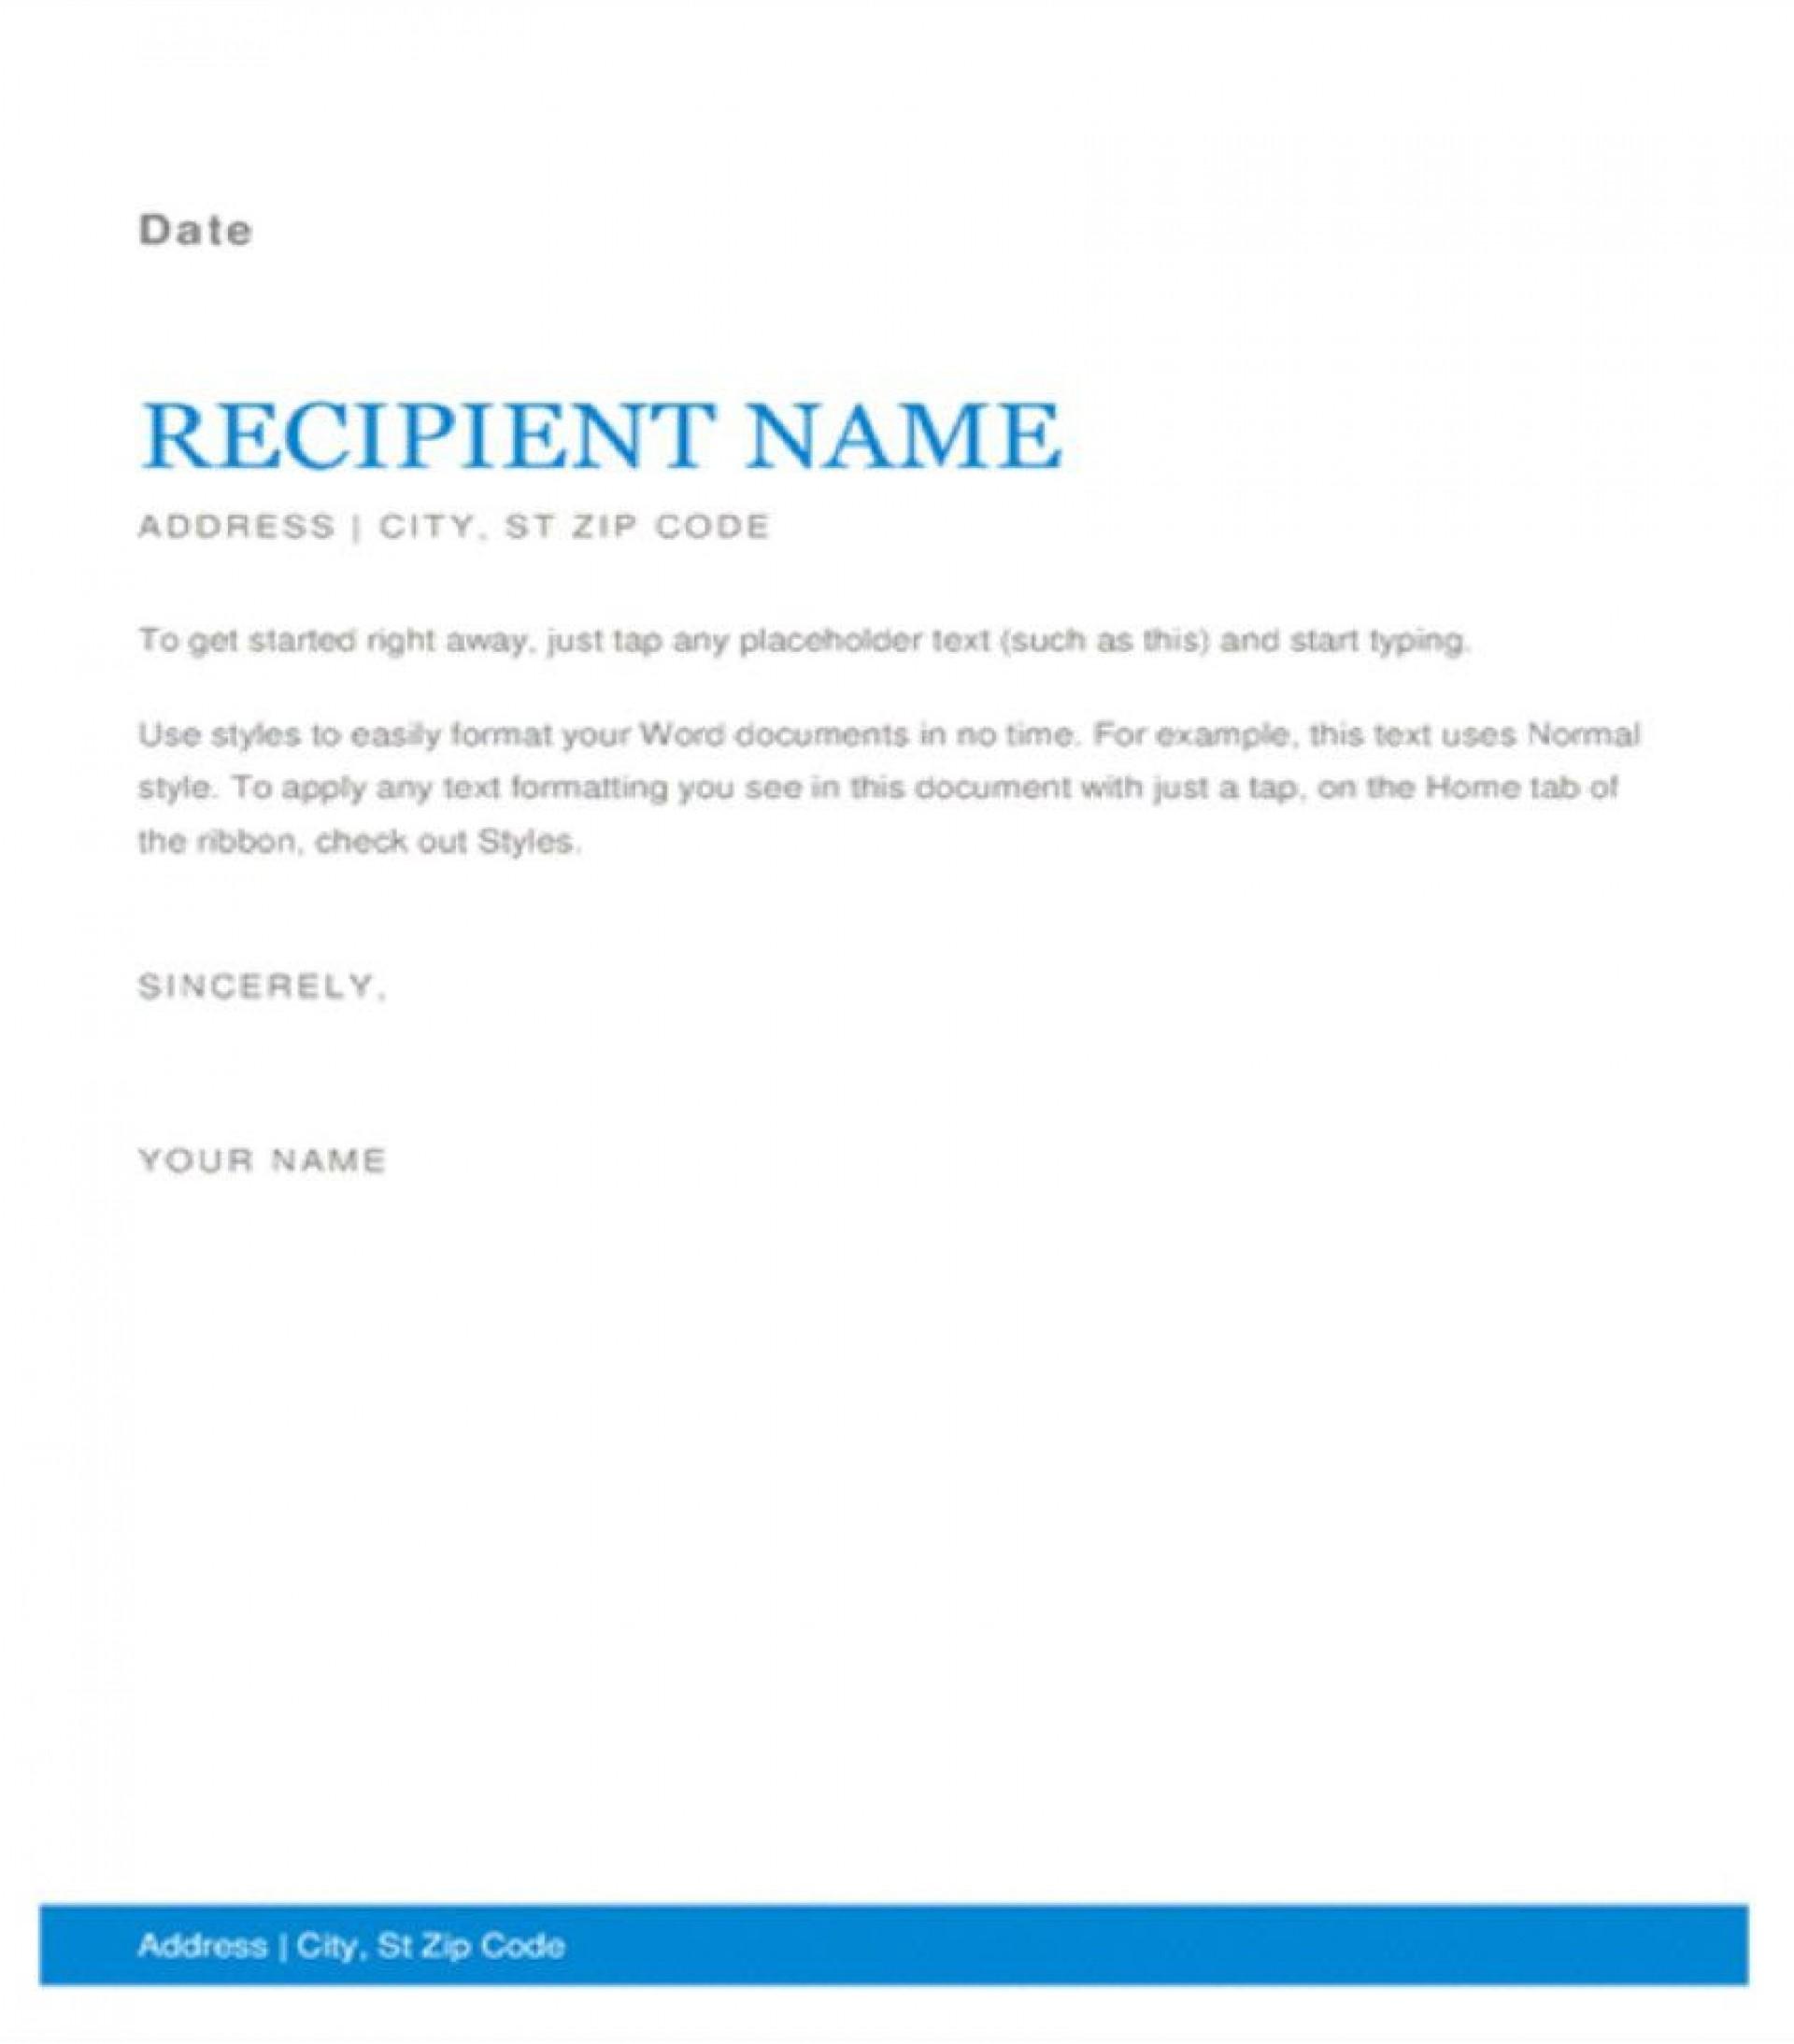 001 Unusual Microsoft Word Template Download Highest Clarity  2010 Resume Free 2007 Error Invoice1920